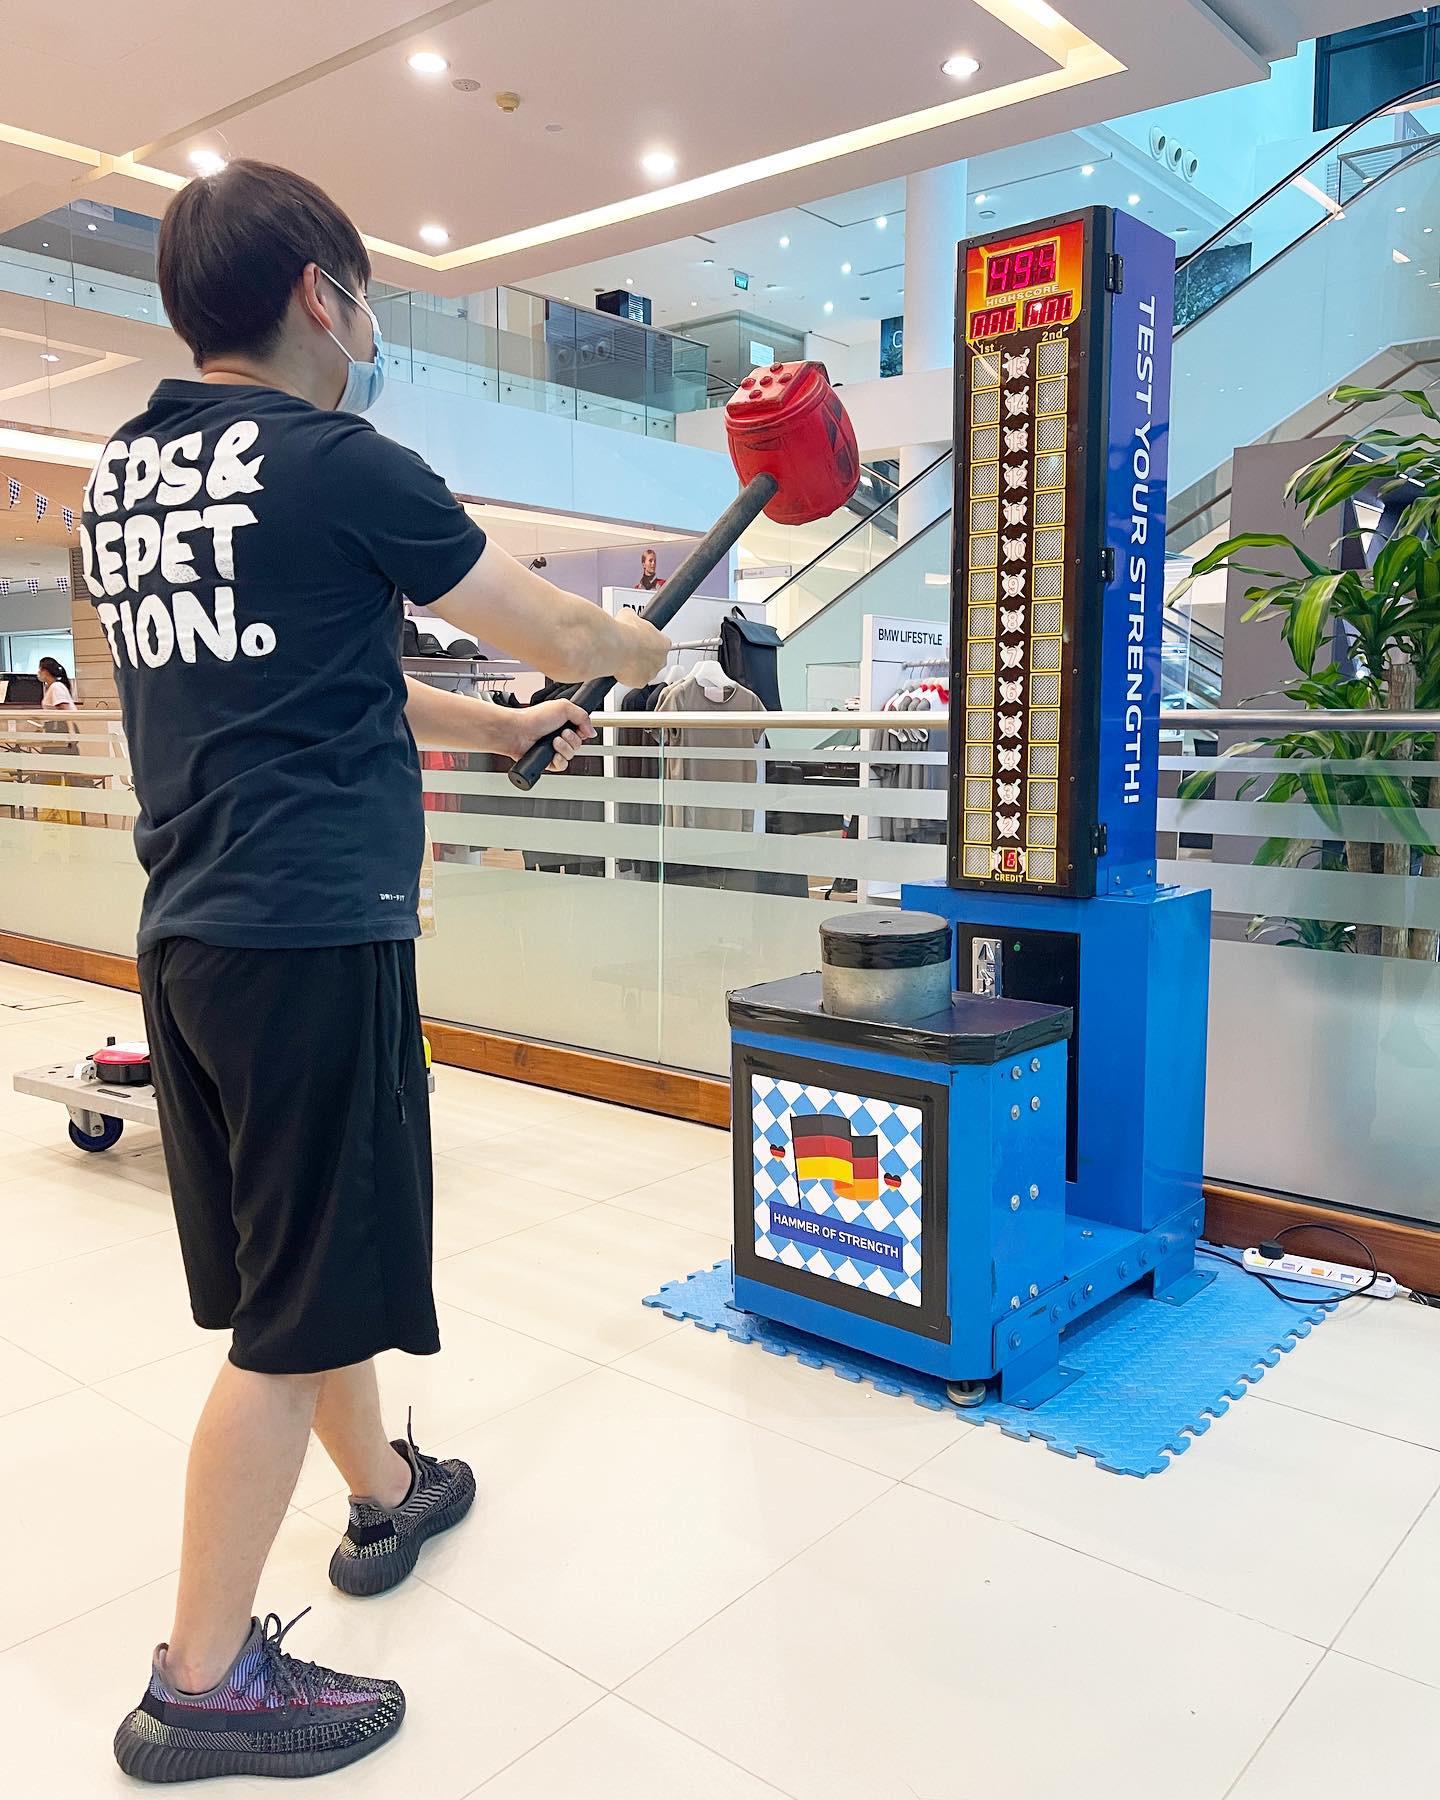 Arcade Kings of Hammer Machine